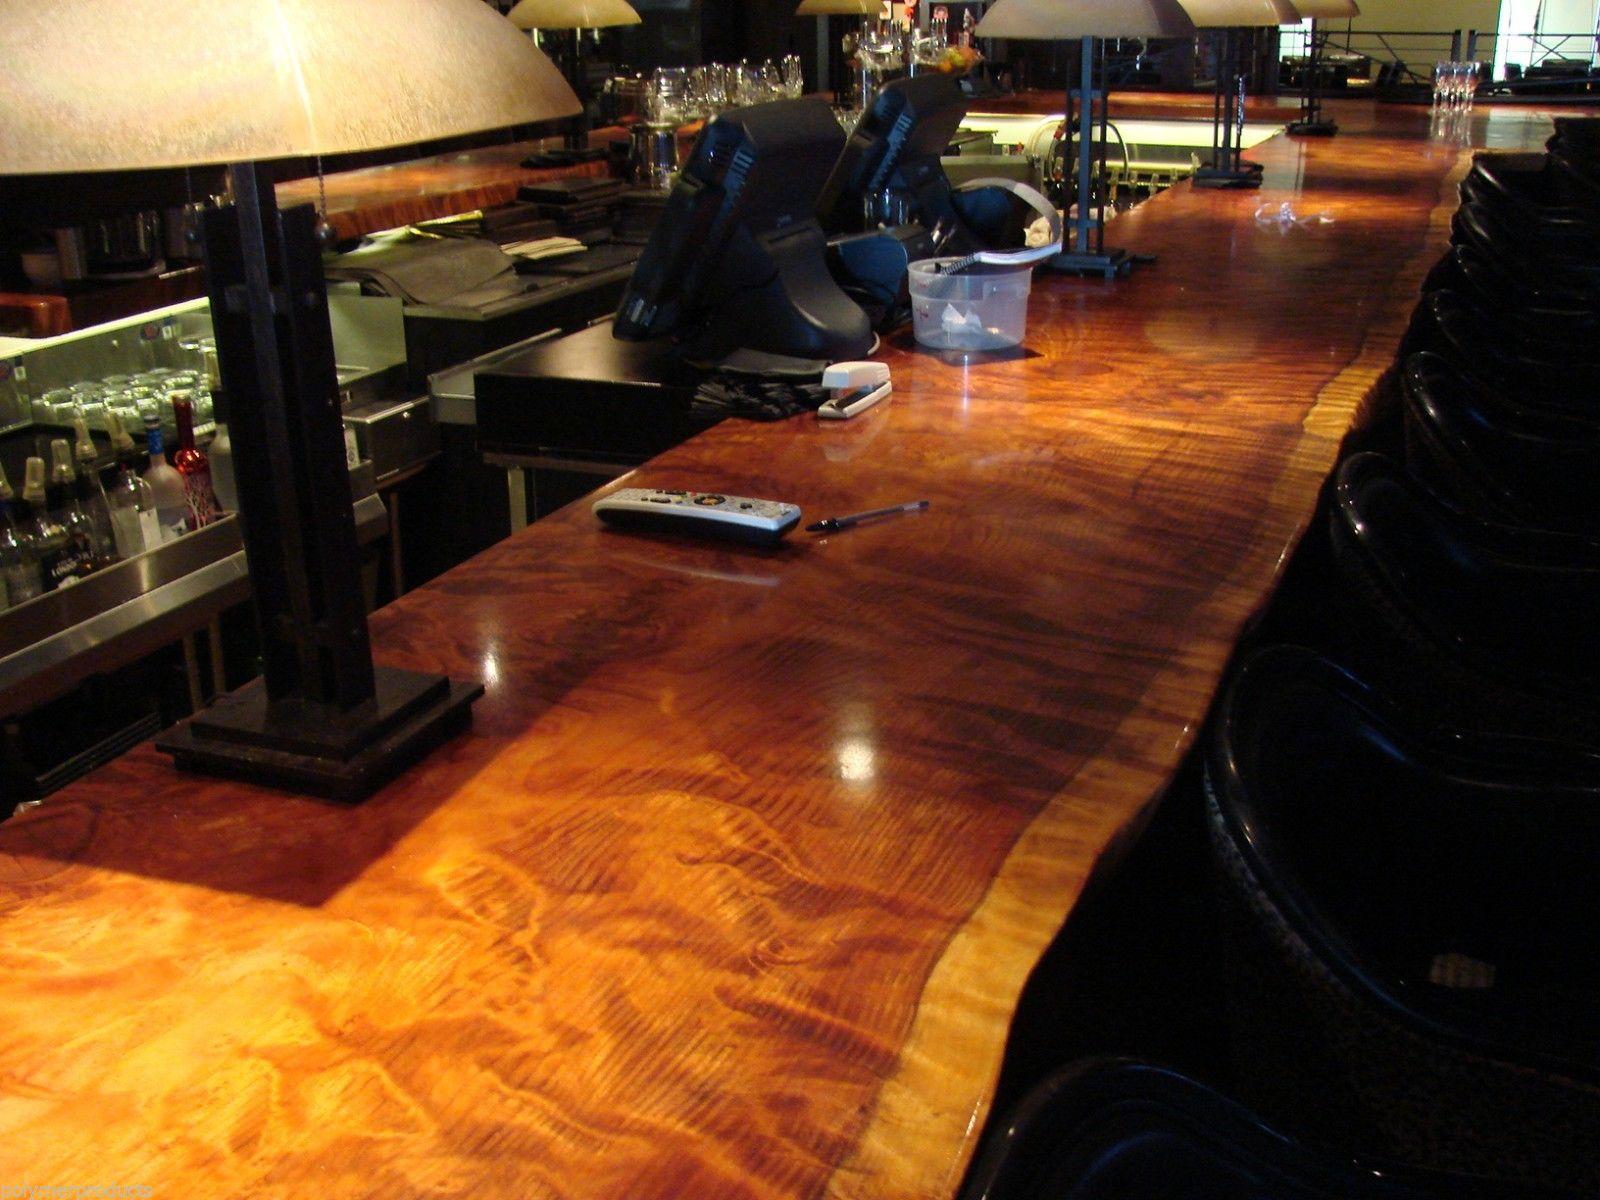 Max 1618 1 5 Gallon Epoxy Thin Wood Coating Resin Very